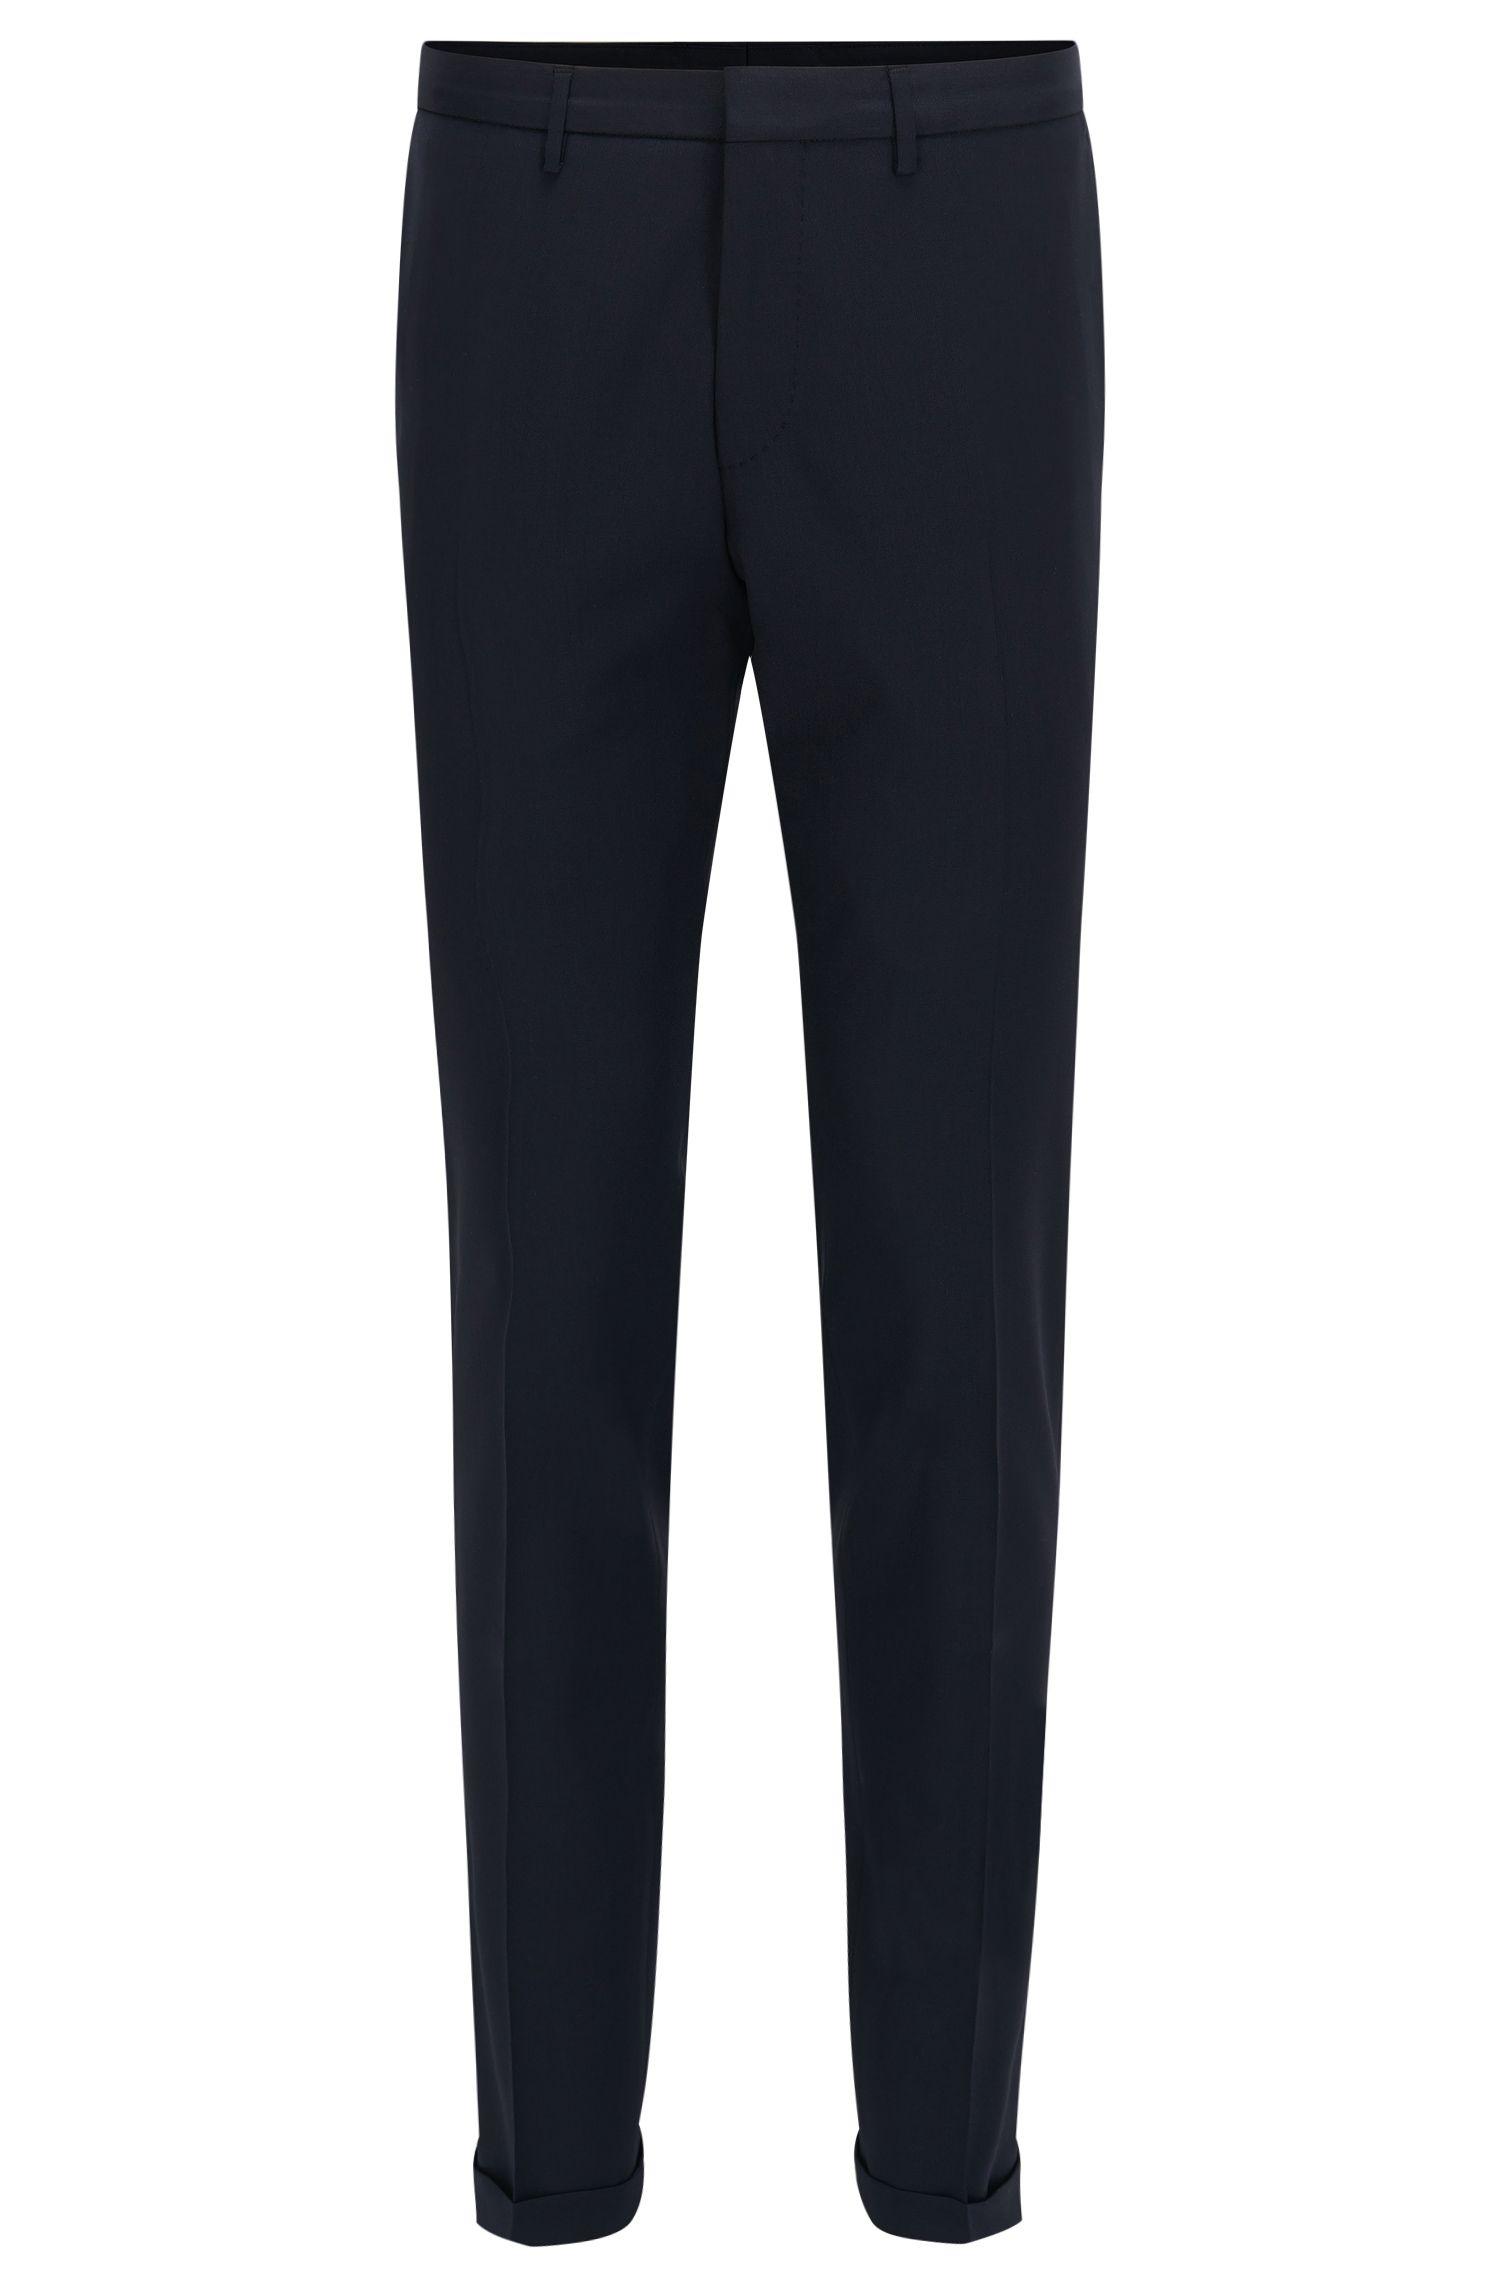 Virgin Wool Dress Pants, Extra Slim Fit | Wave CYL